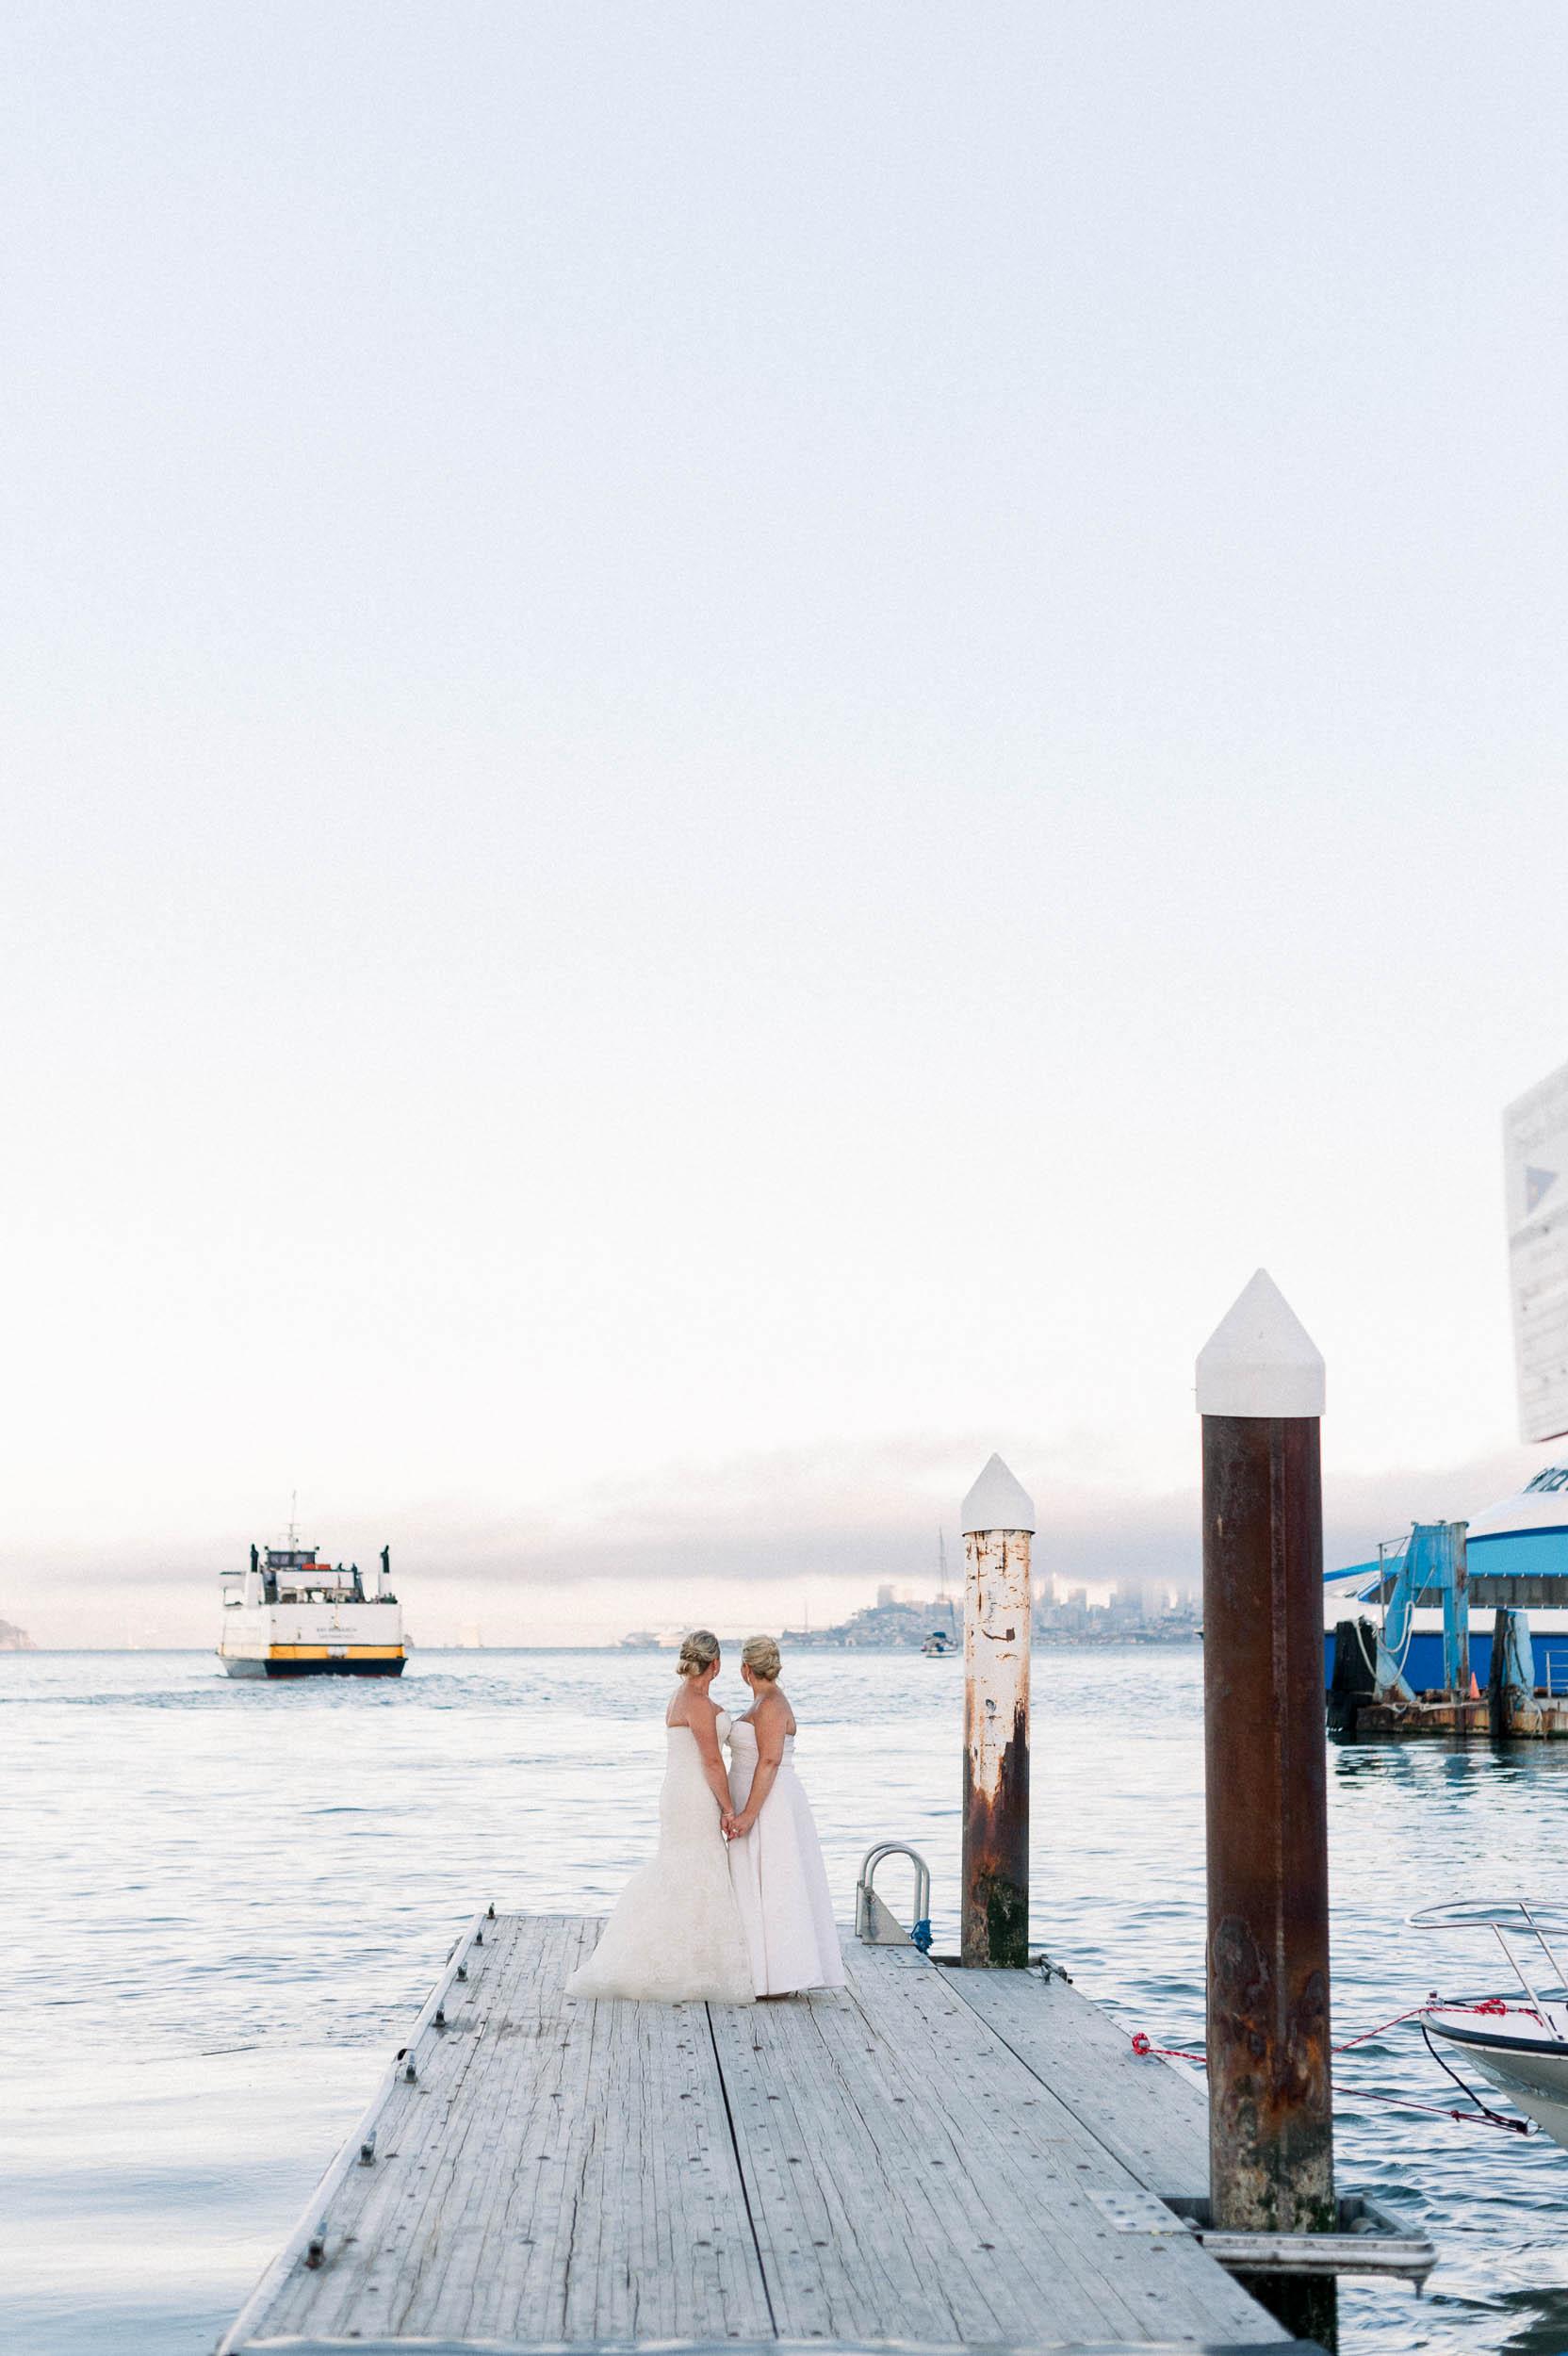 092218KF1213_Sausalito Yacht Club Wedding_Buena Lane Photography.jpg